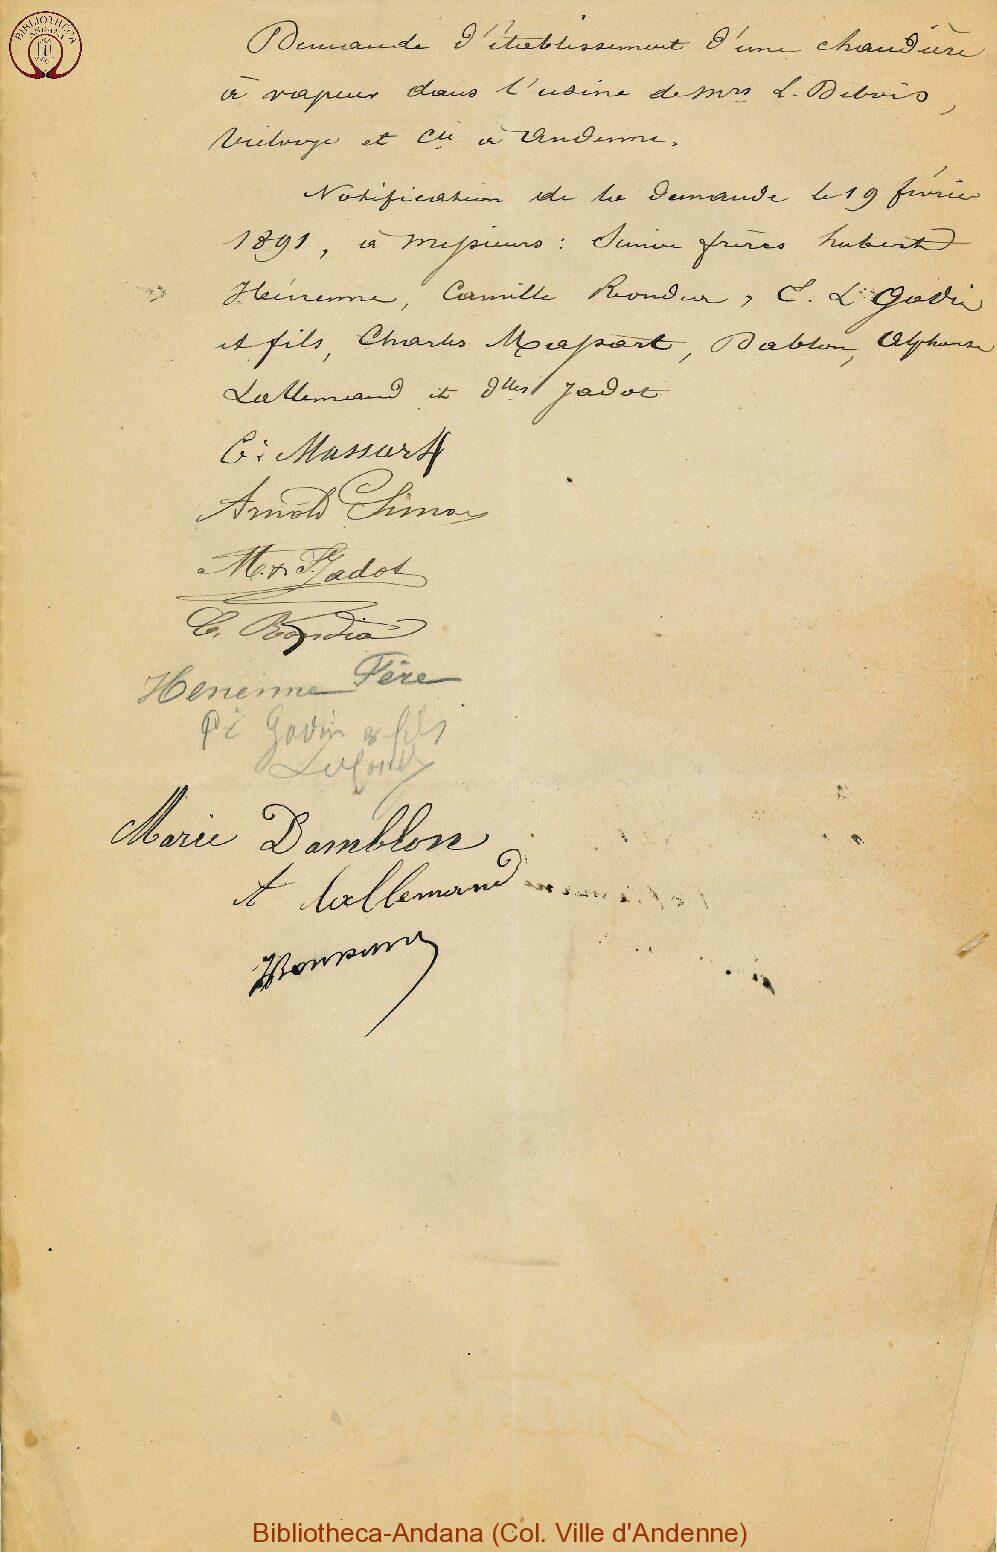 1891-02-19